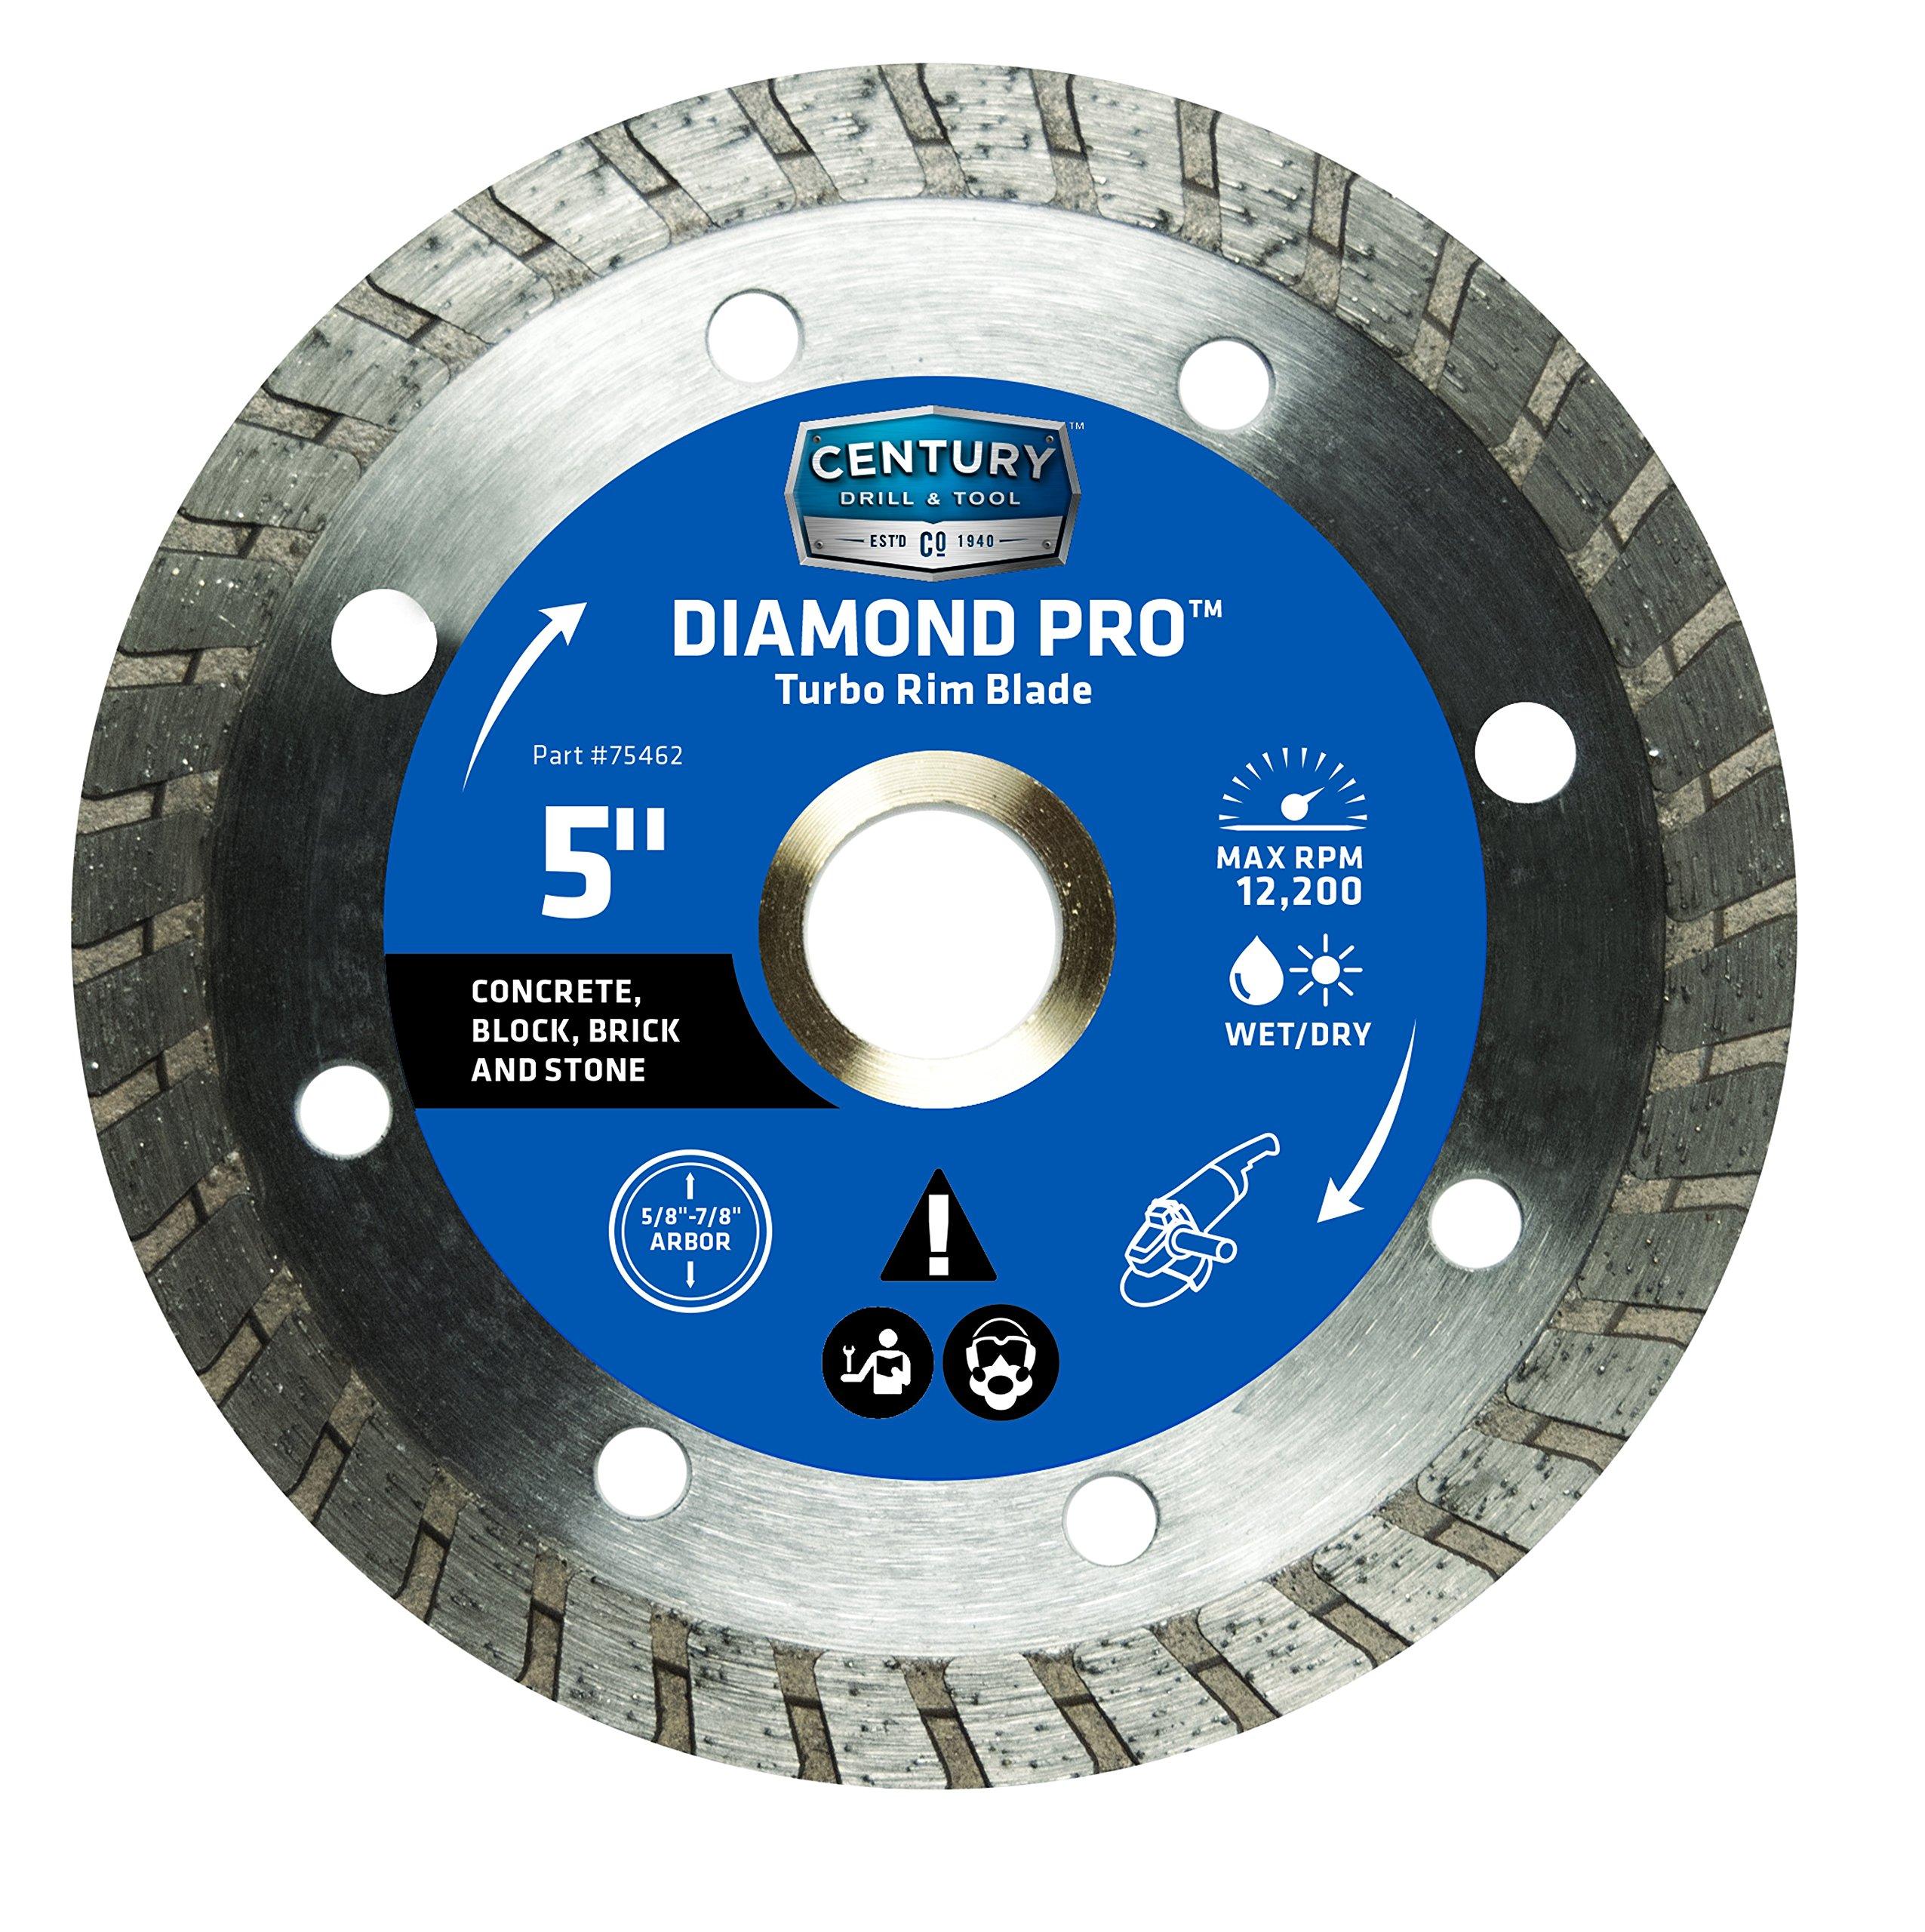 Century Drill and Tool 75462 Professional Turbo Rim Diamond Saw Blade, 5''